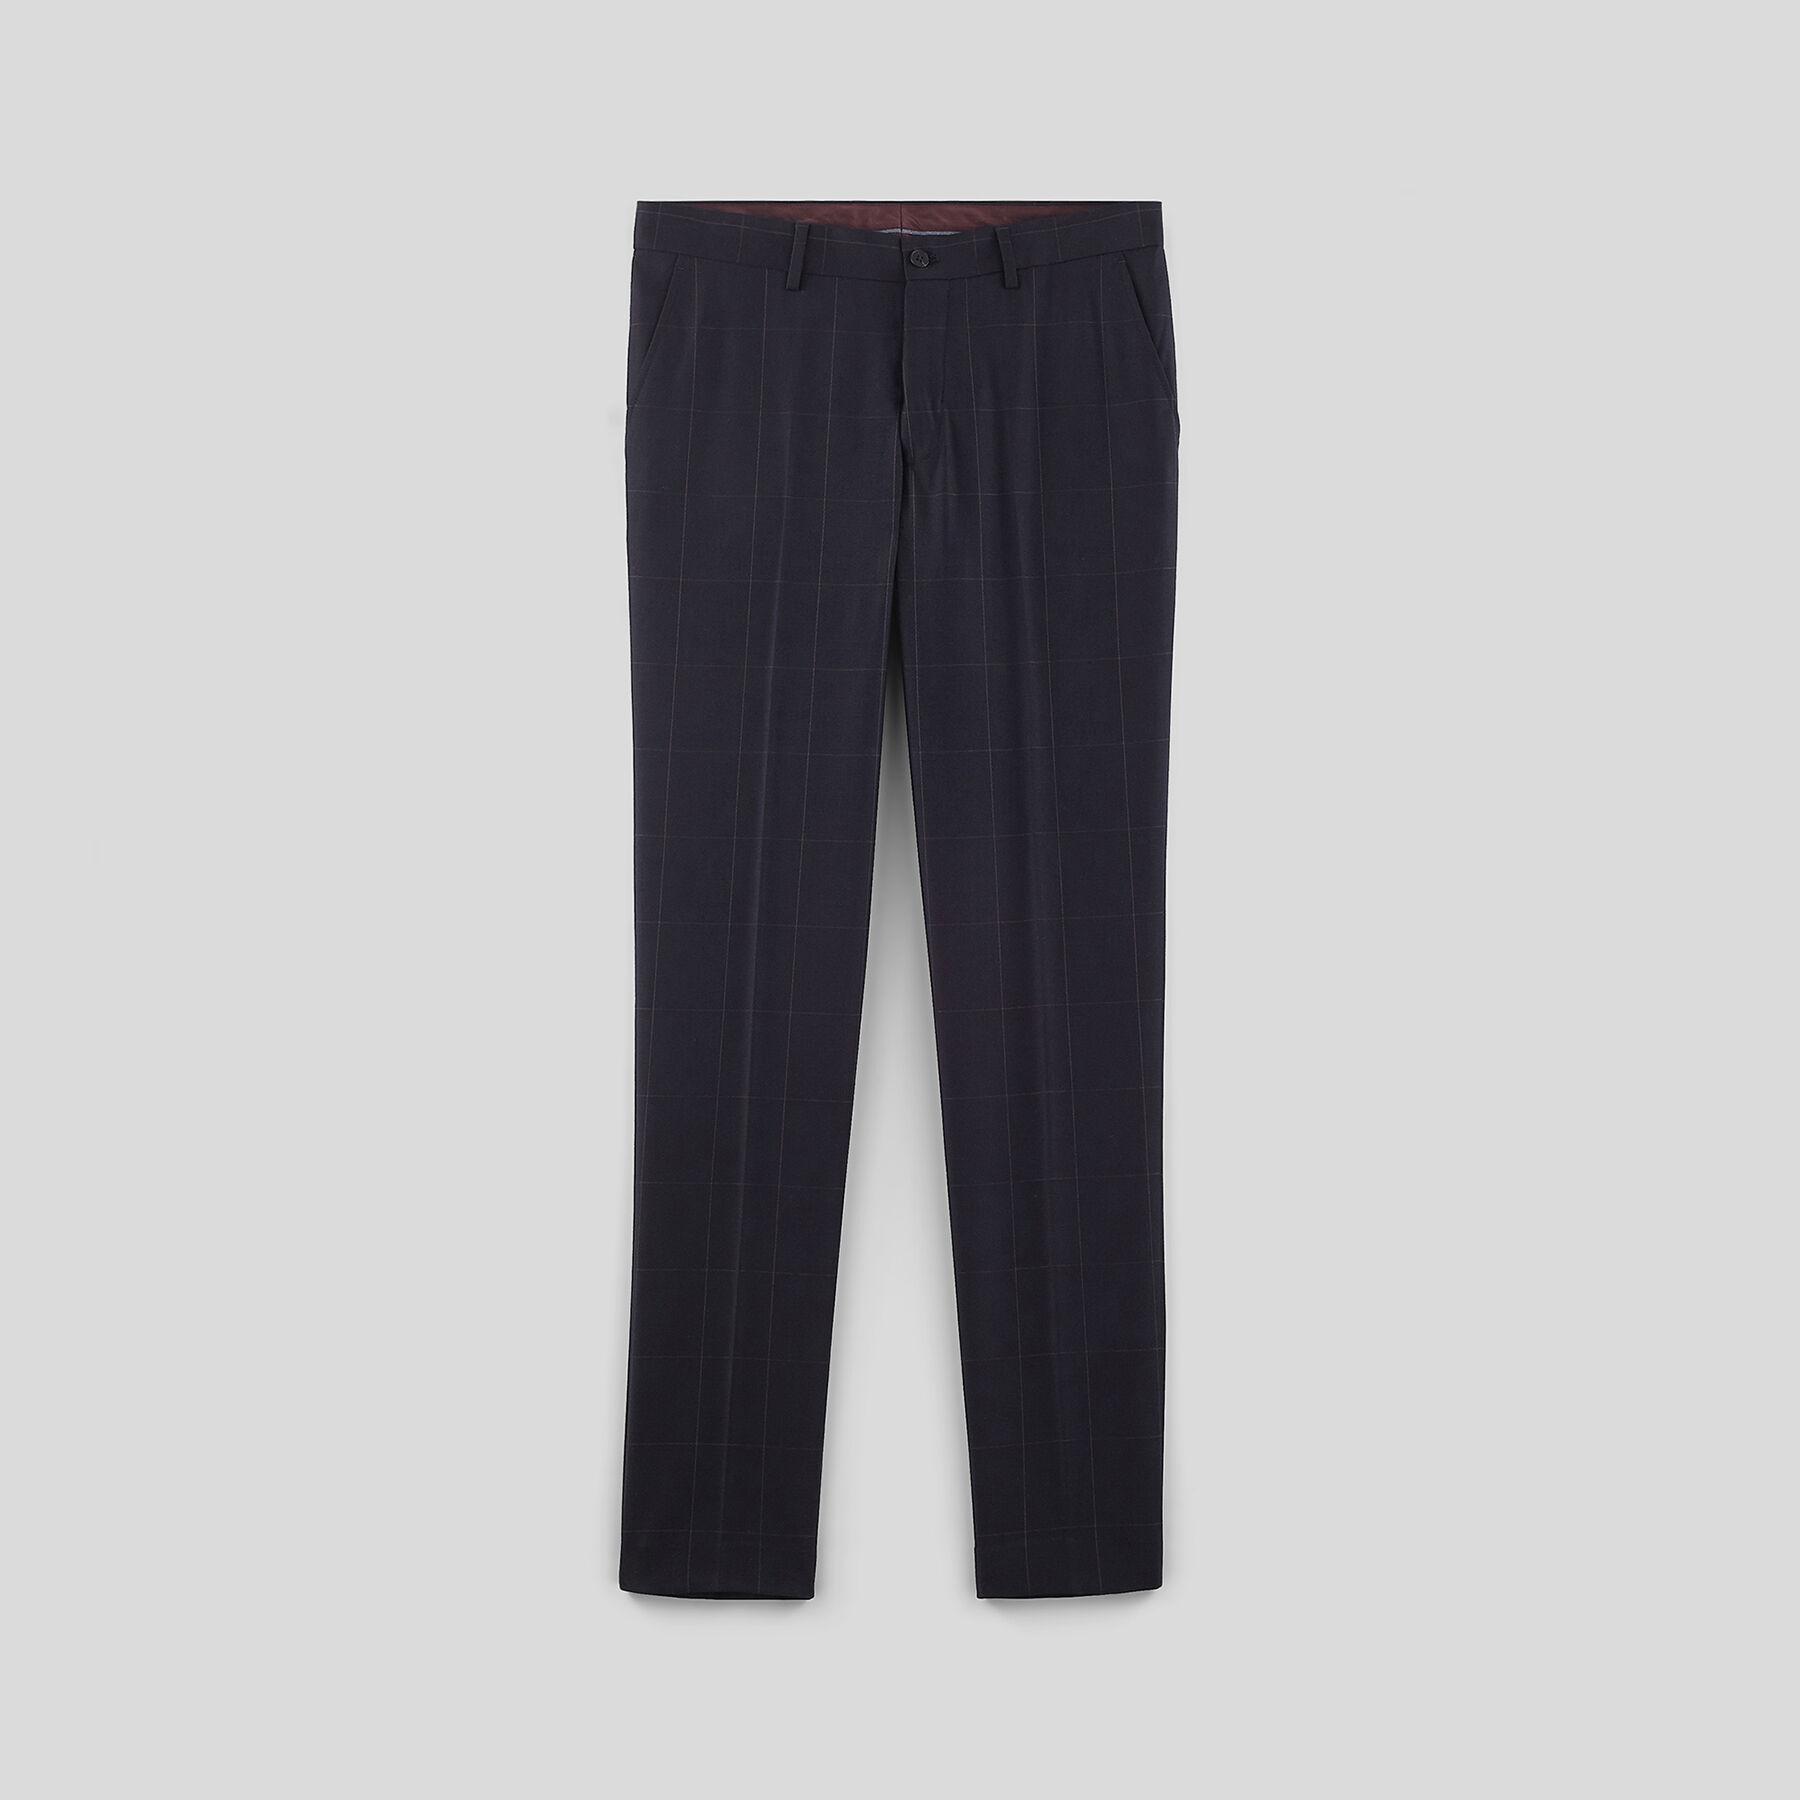 pantalon de costume carreaux extra slim bleu marine. Black Bedroom Furniture Sets. Home Design Ideas